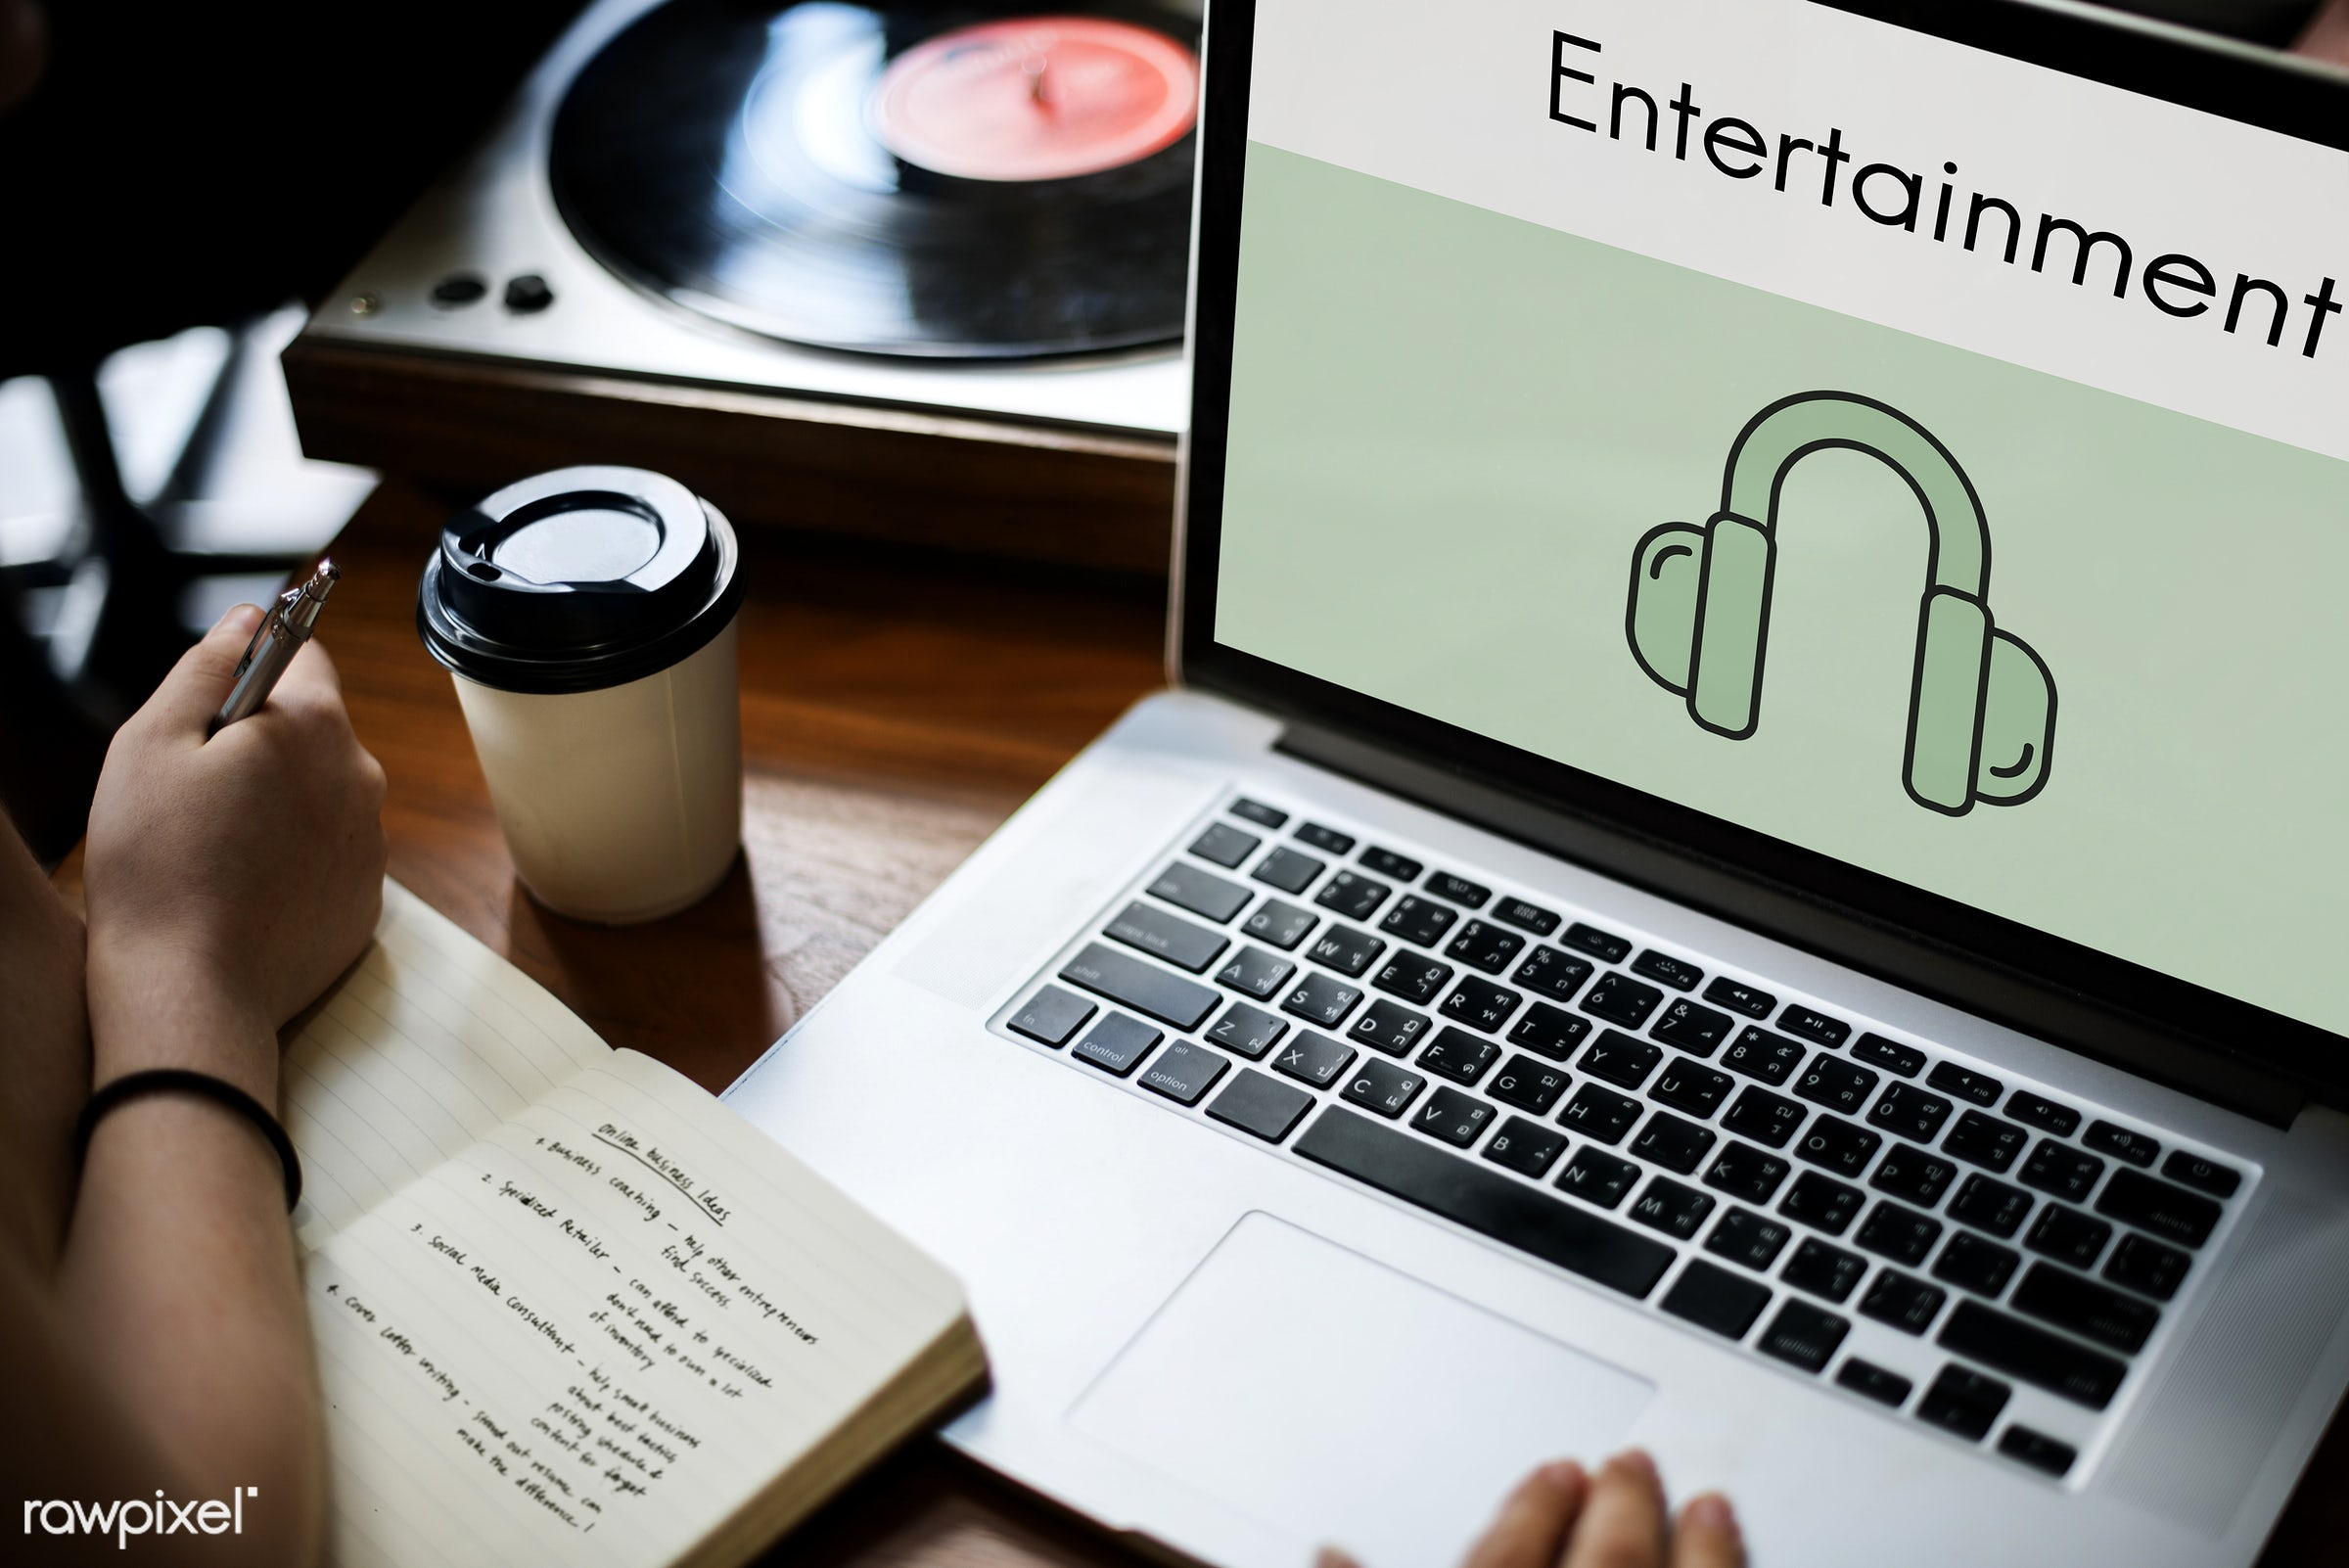 audio, broadcast, browsing, coffee cup, device, digital, digital device, earphones, entertainment, graphics, hands, harmony...